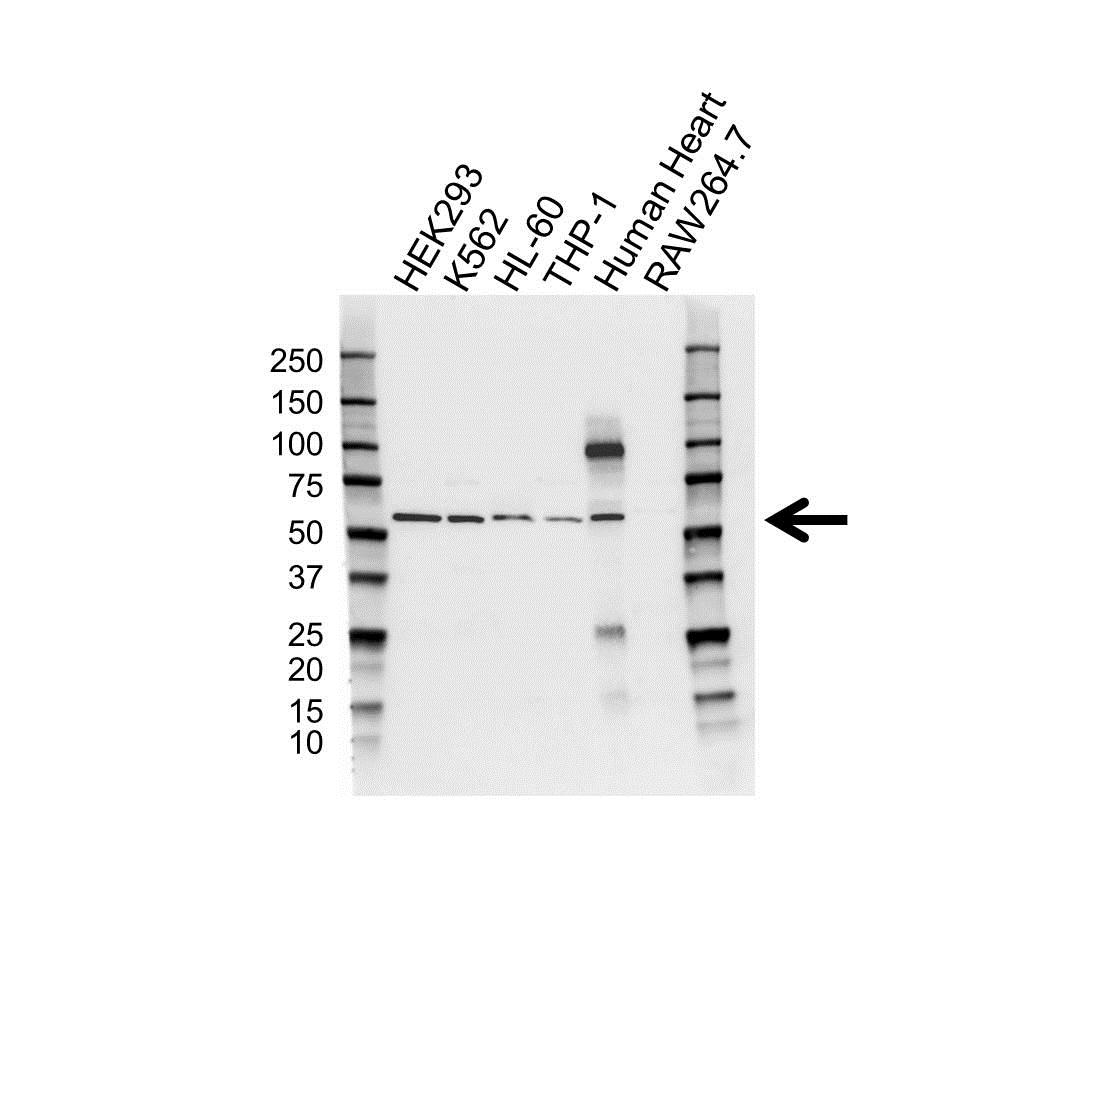 Anti Cytochrome P450 1A1 Antibody (PrecisionAb Polyclonal Antibody) gallery image 1